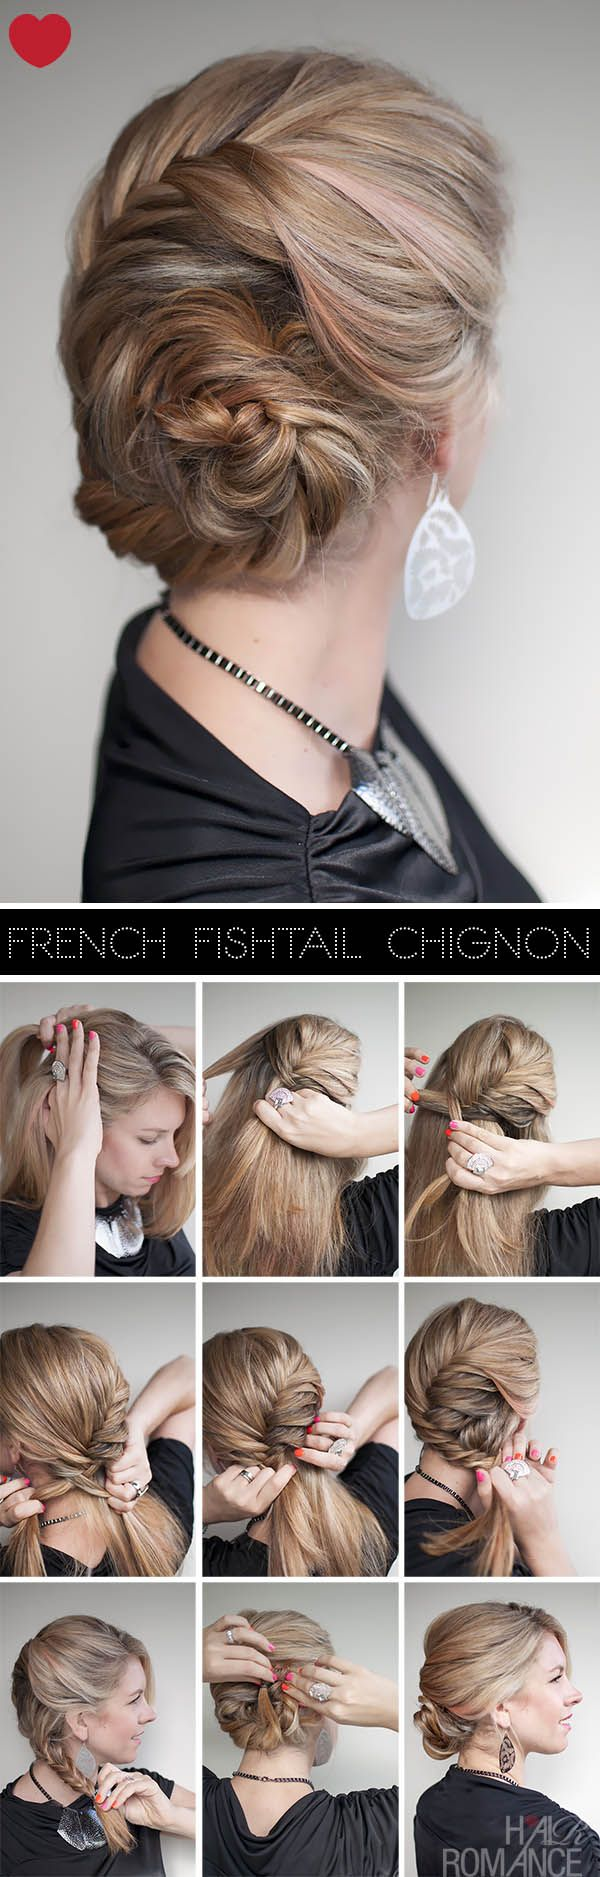 DIY French Fishtail Chignon diy diy ideas easy diy diy beauty diy hair diy fashion beauty diy diy bun diy style diy hair style diy updo